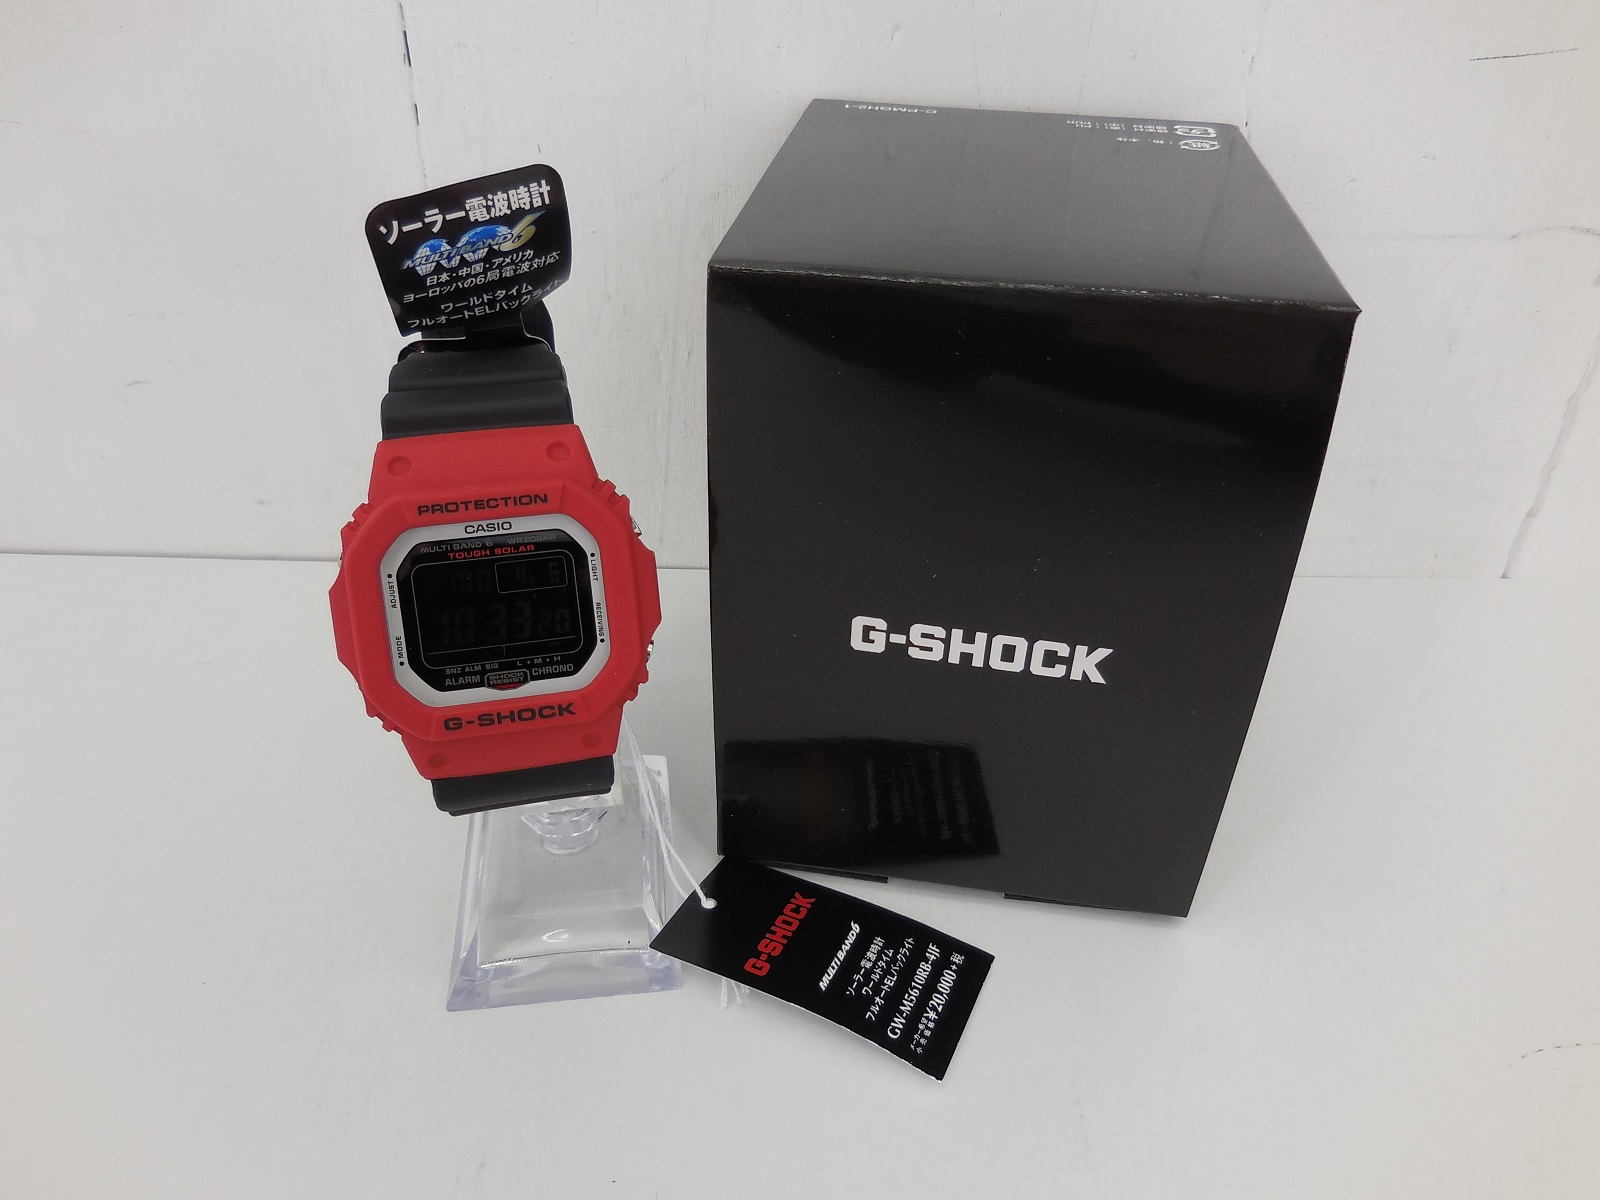 G-SHOCK GW-M5610RB ジーショック 電波ソーラー レッド×ブラック